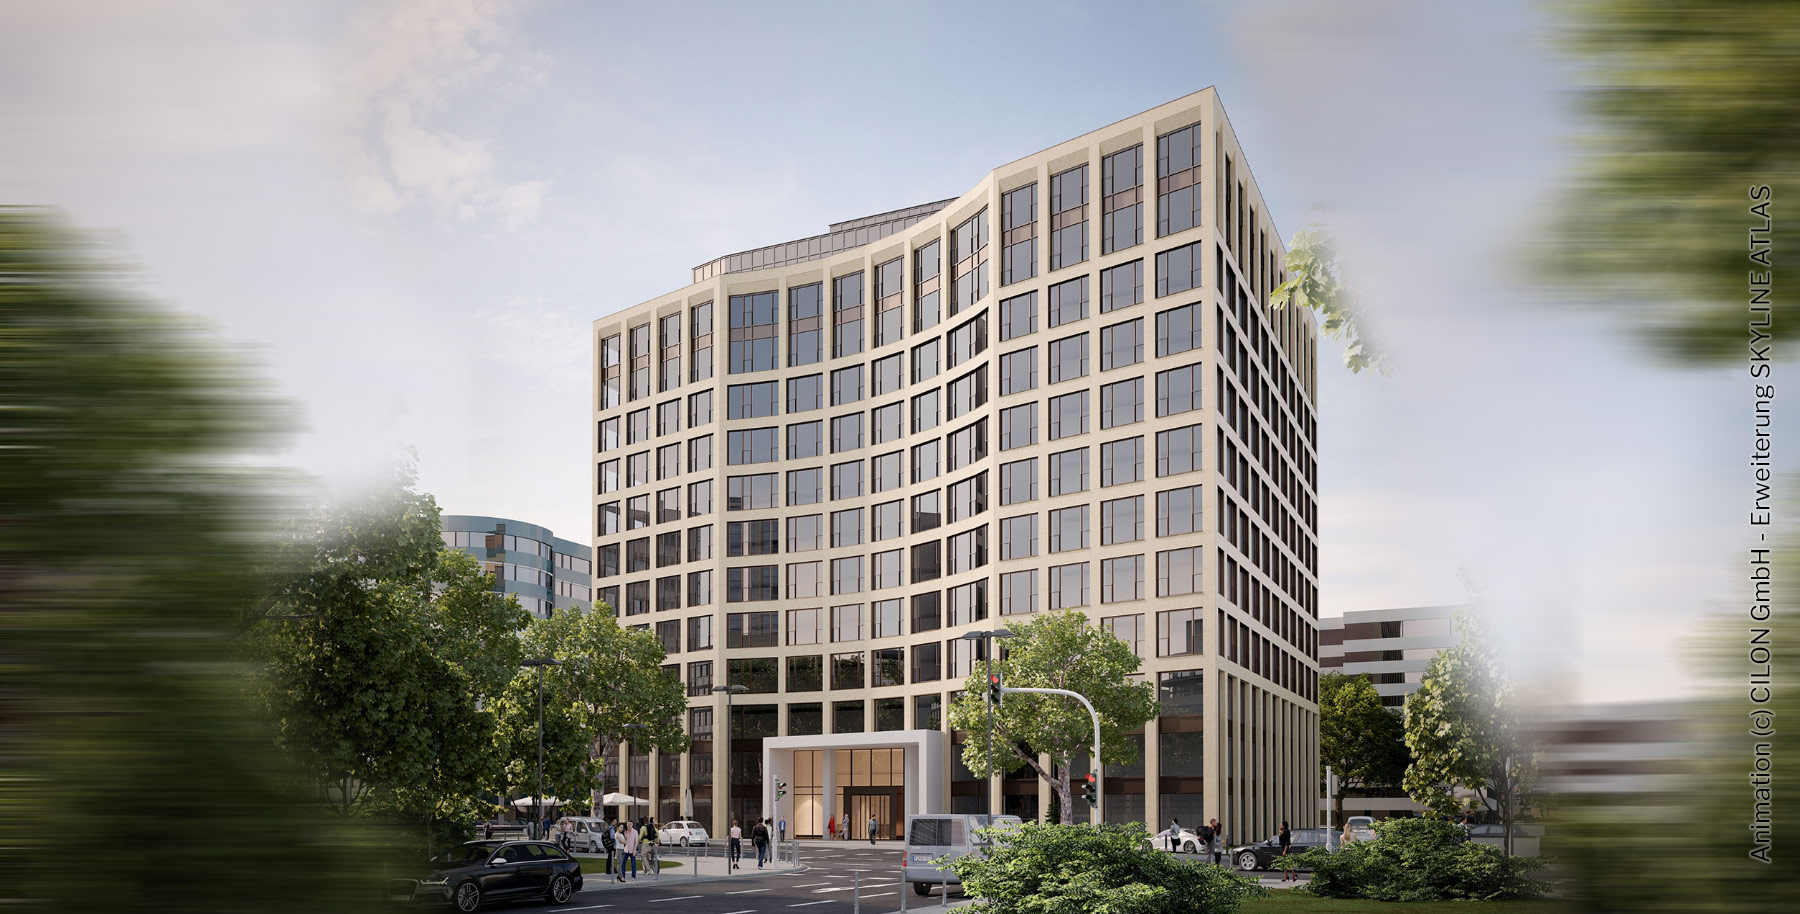 Sky Eschborn - Bürohaus in Eschborn - Moderne Büroflächen zur Miete - Vermietung - Bürogebäude Neubau